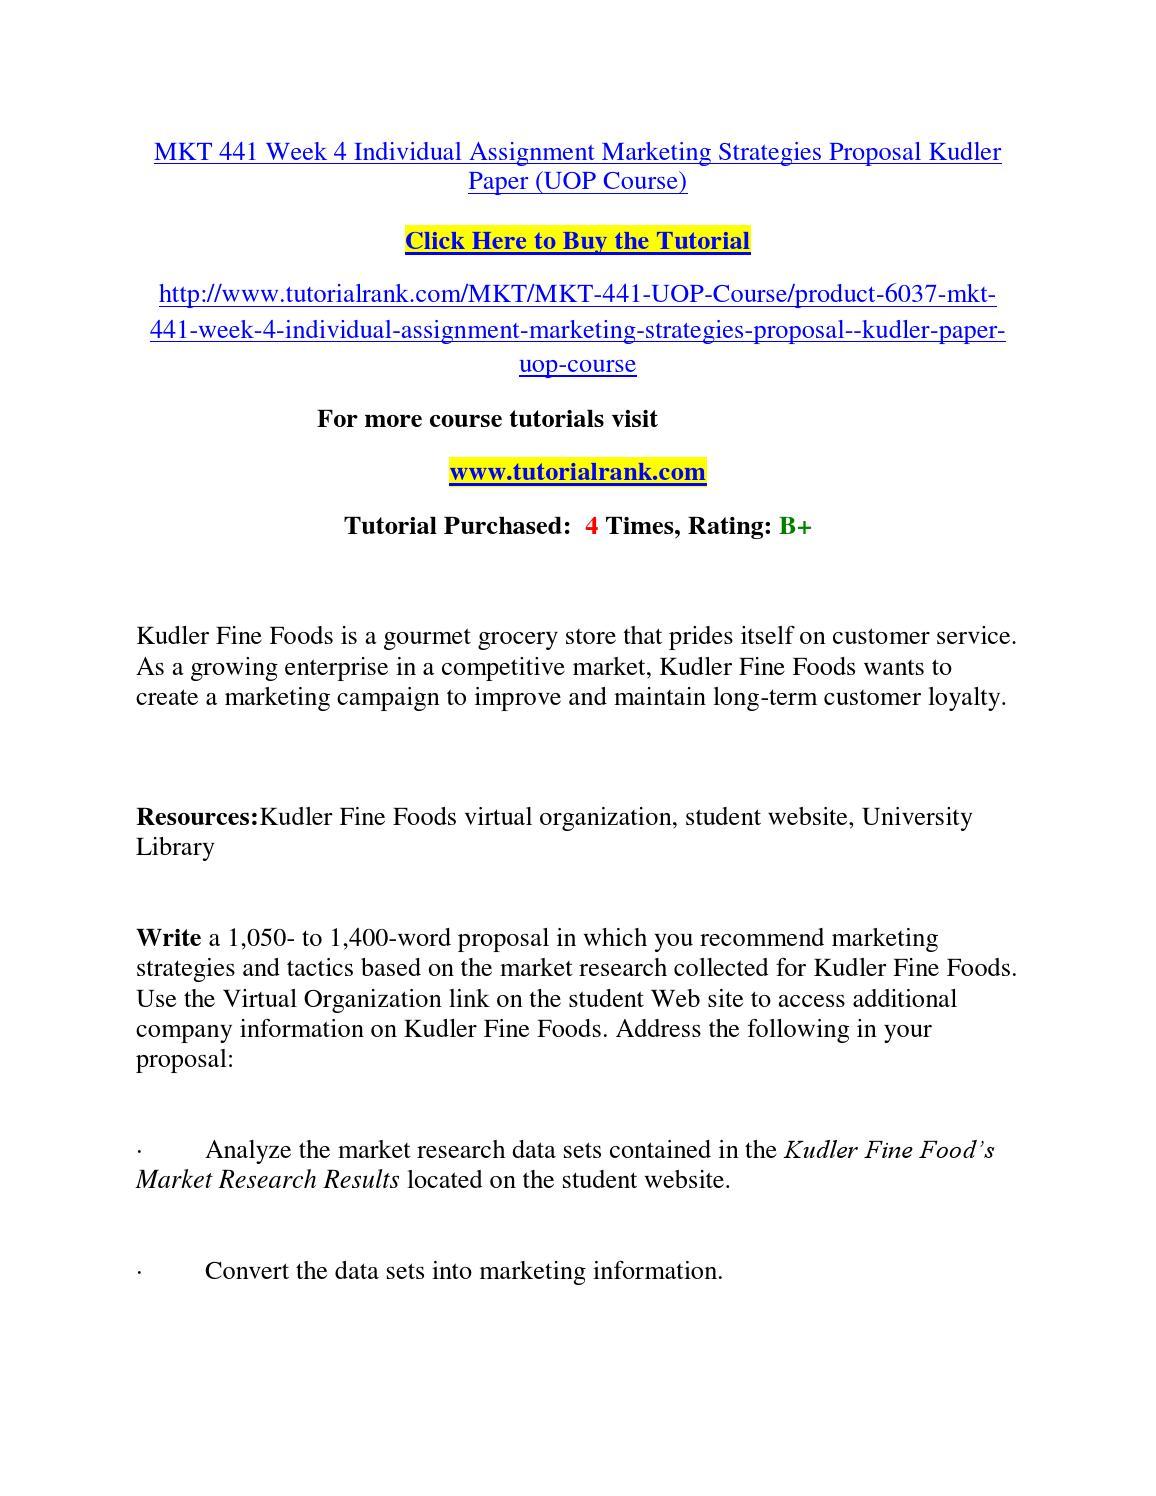 marketing research paper kudler fine foods virtual organization